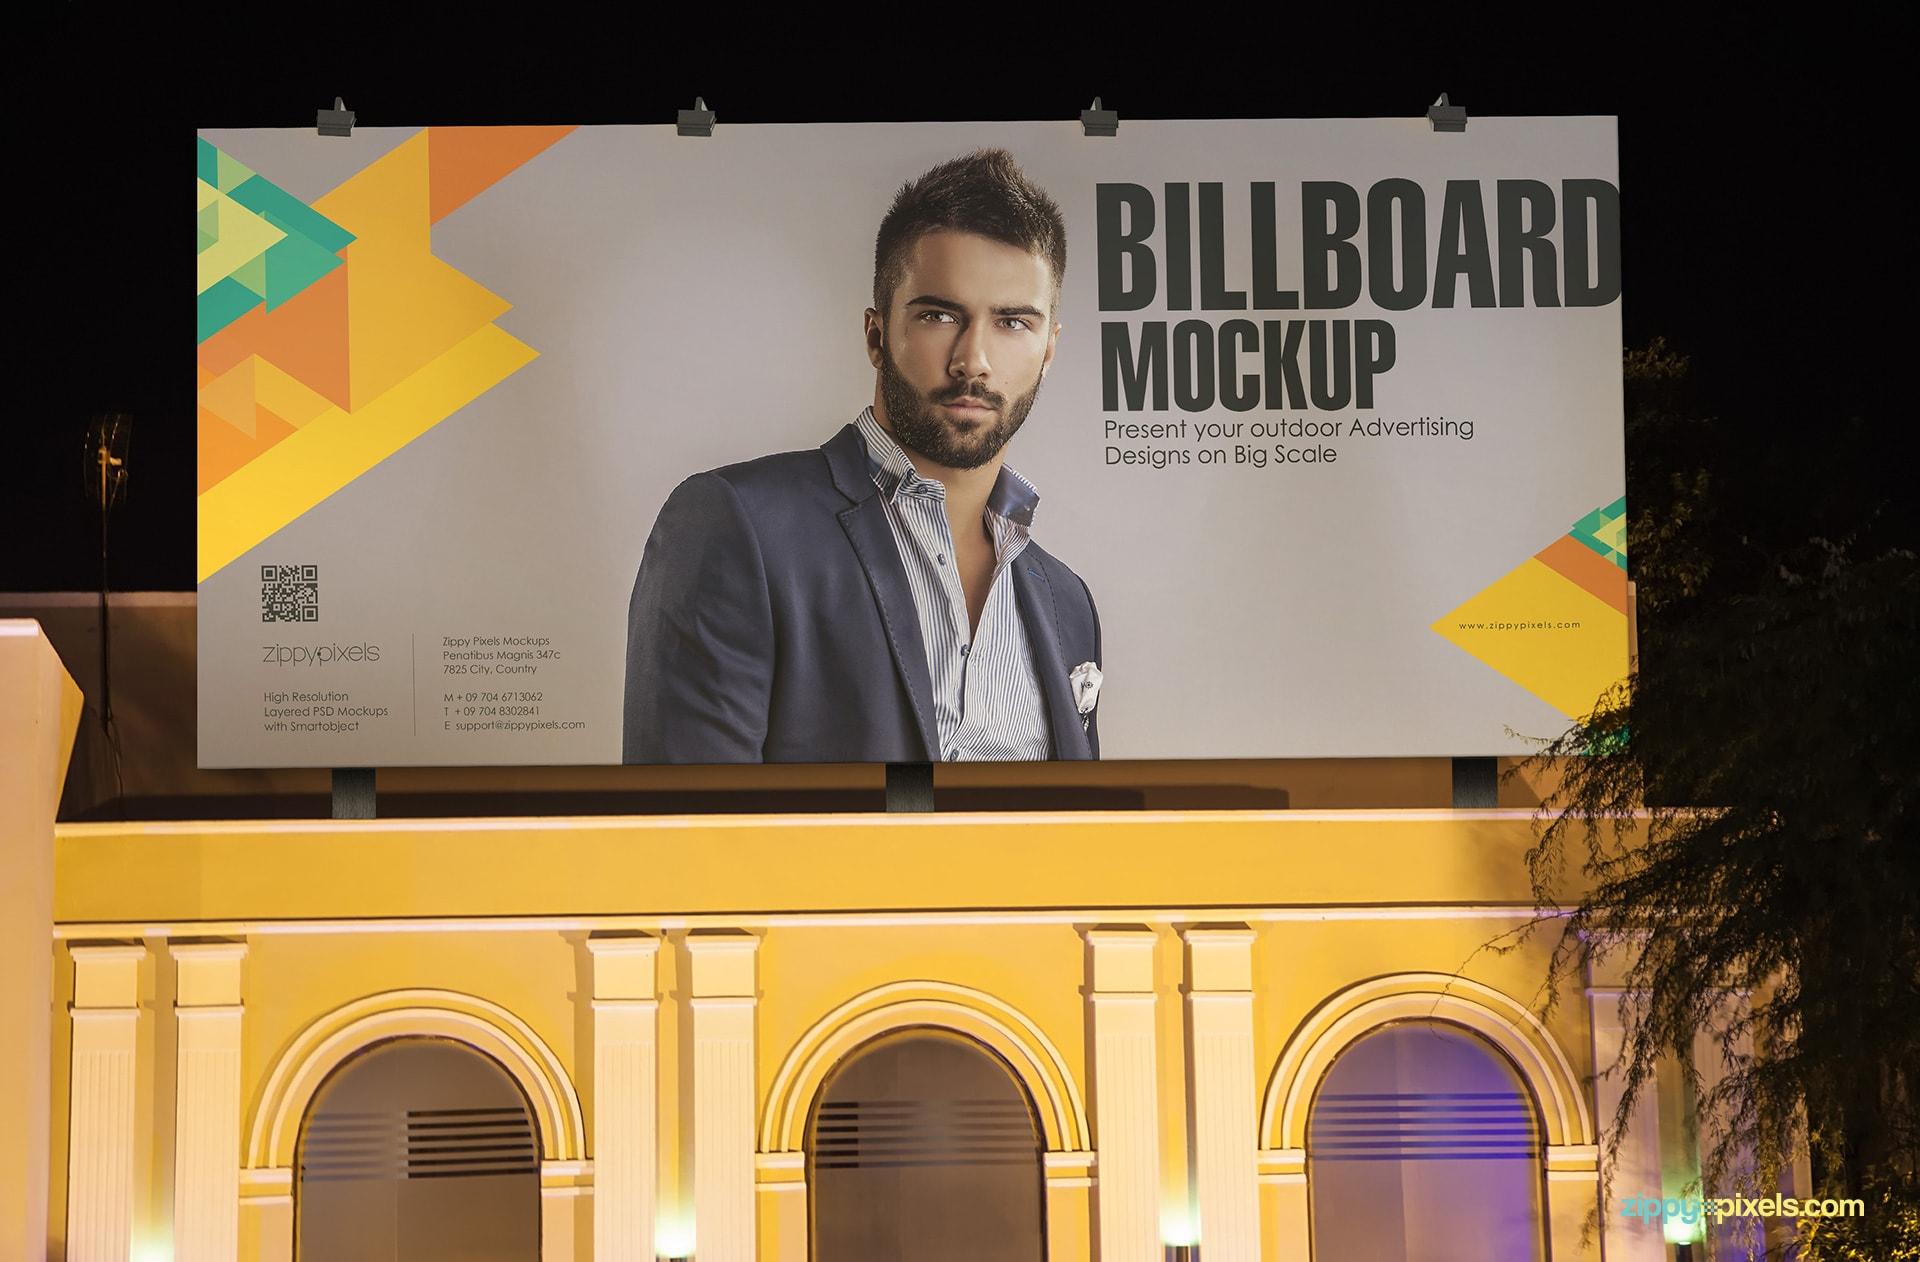 Billboard Mockup PSD - Beautiful lighted billboard in the dark night